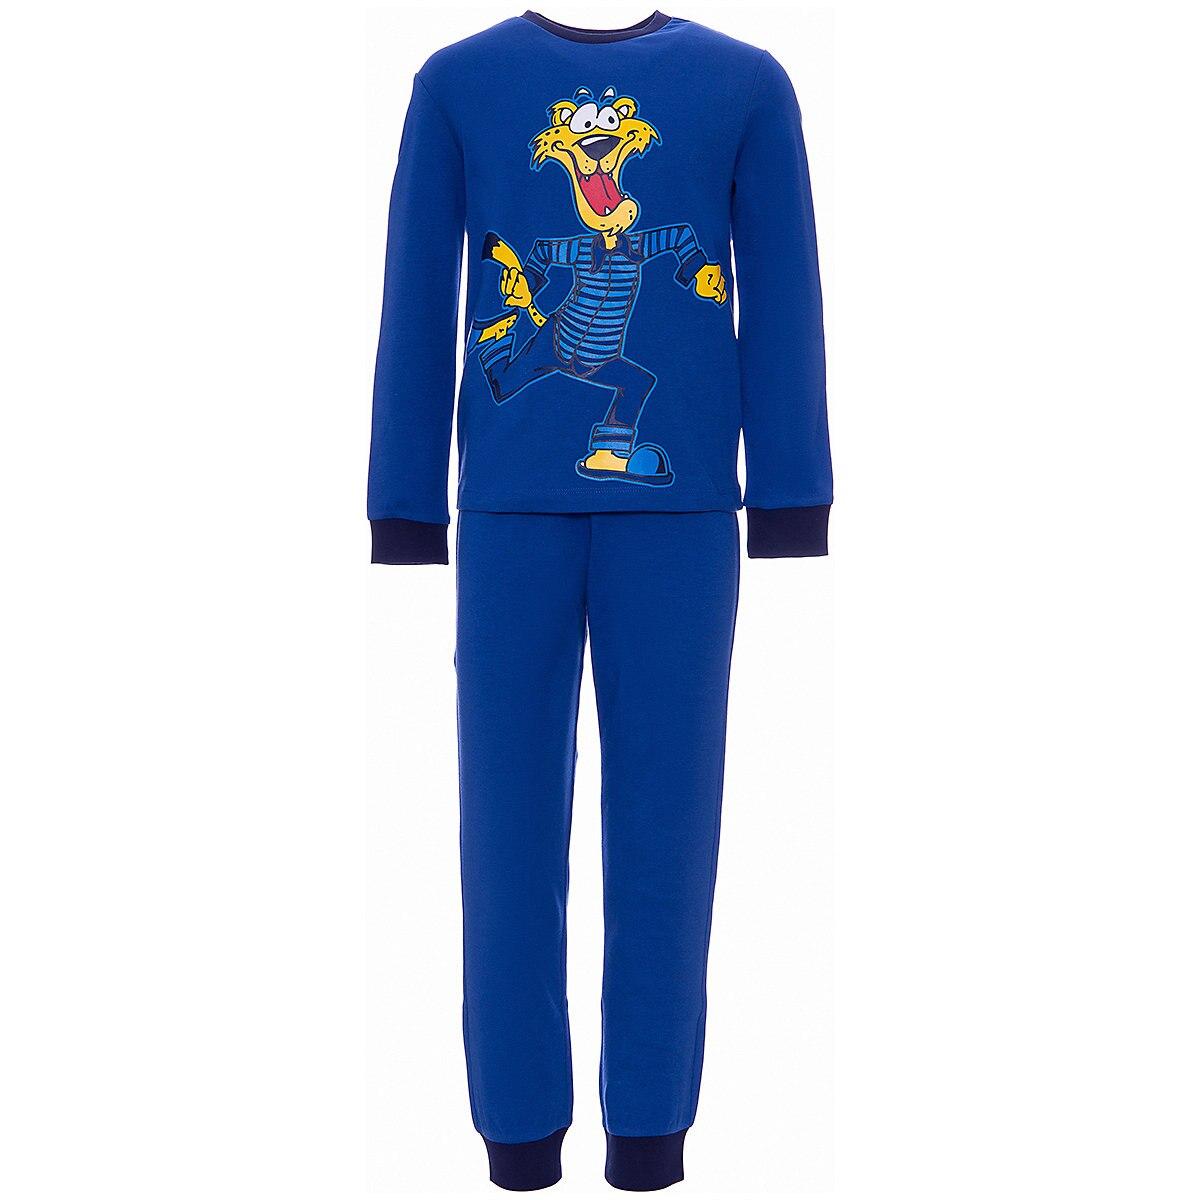 ORIGINAL MARINES Sleepwear & Robes 9501034 Cotton Baby Boys clothing pajamas wu nong wudang tai chi clothing robes uniforms surplices men and women hanfu taijiquan clothing coat winter thick robe